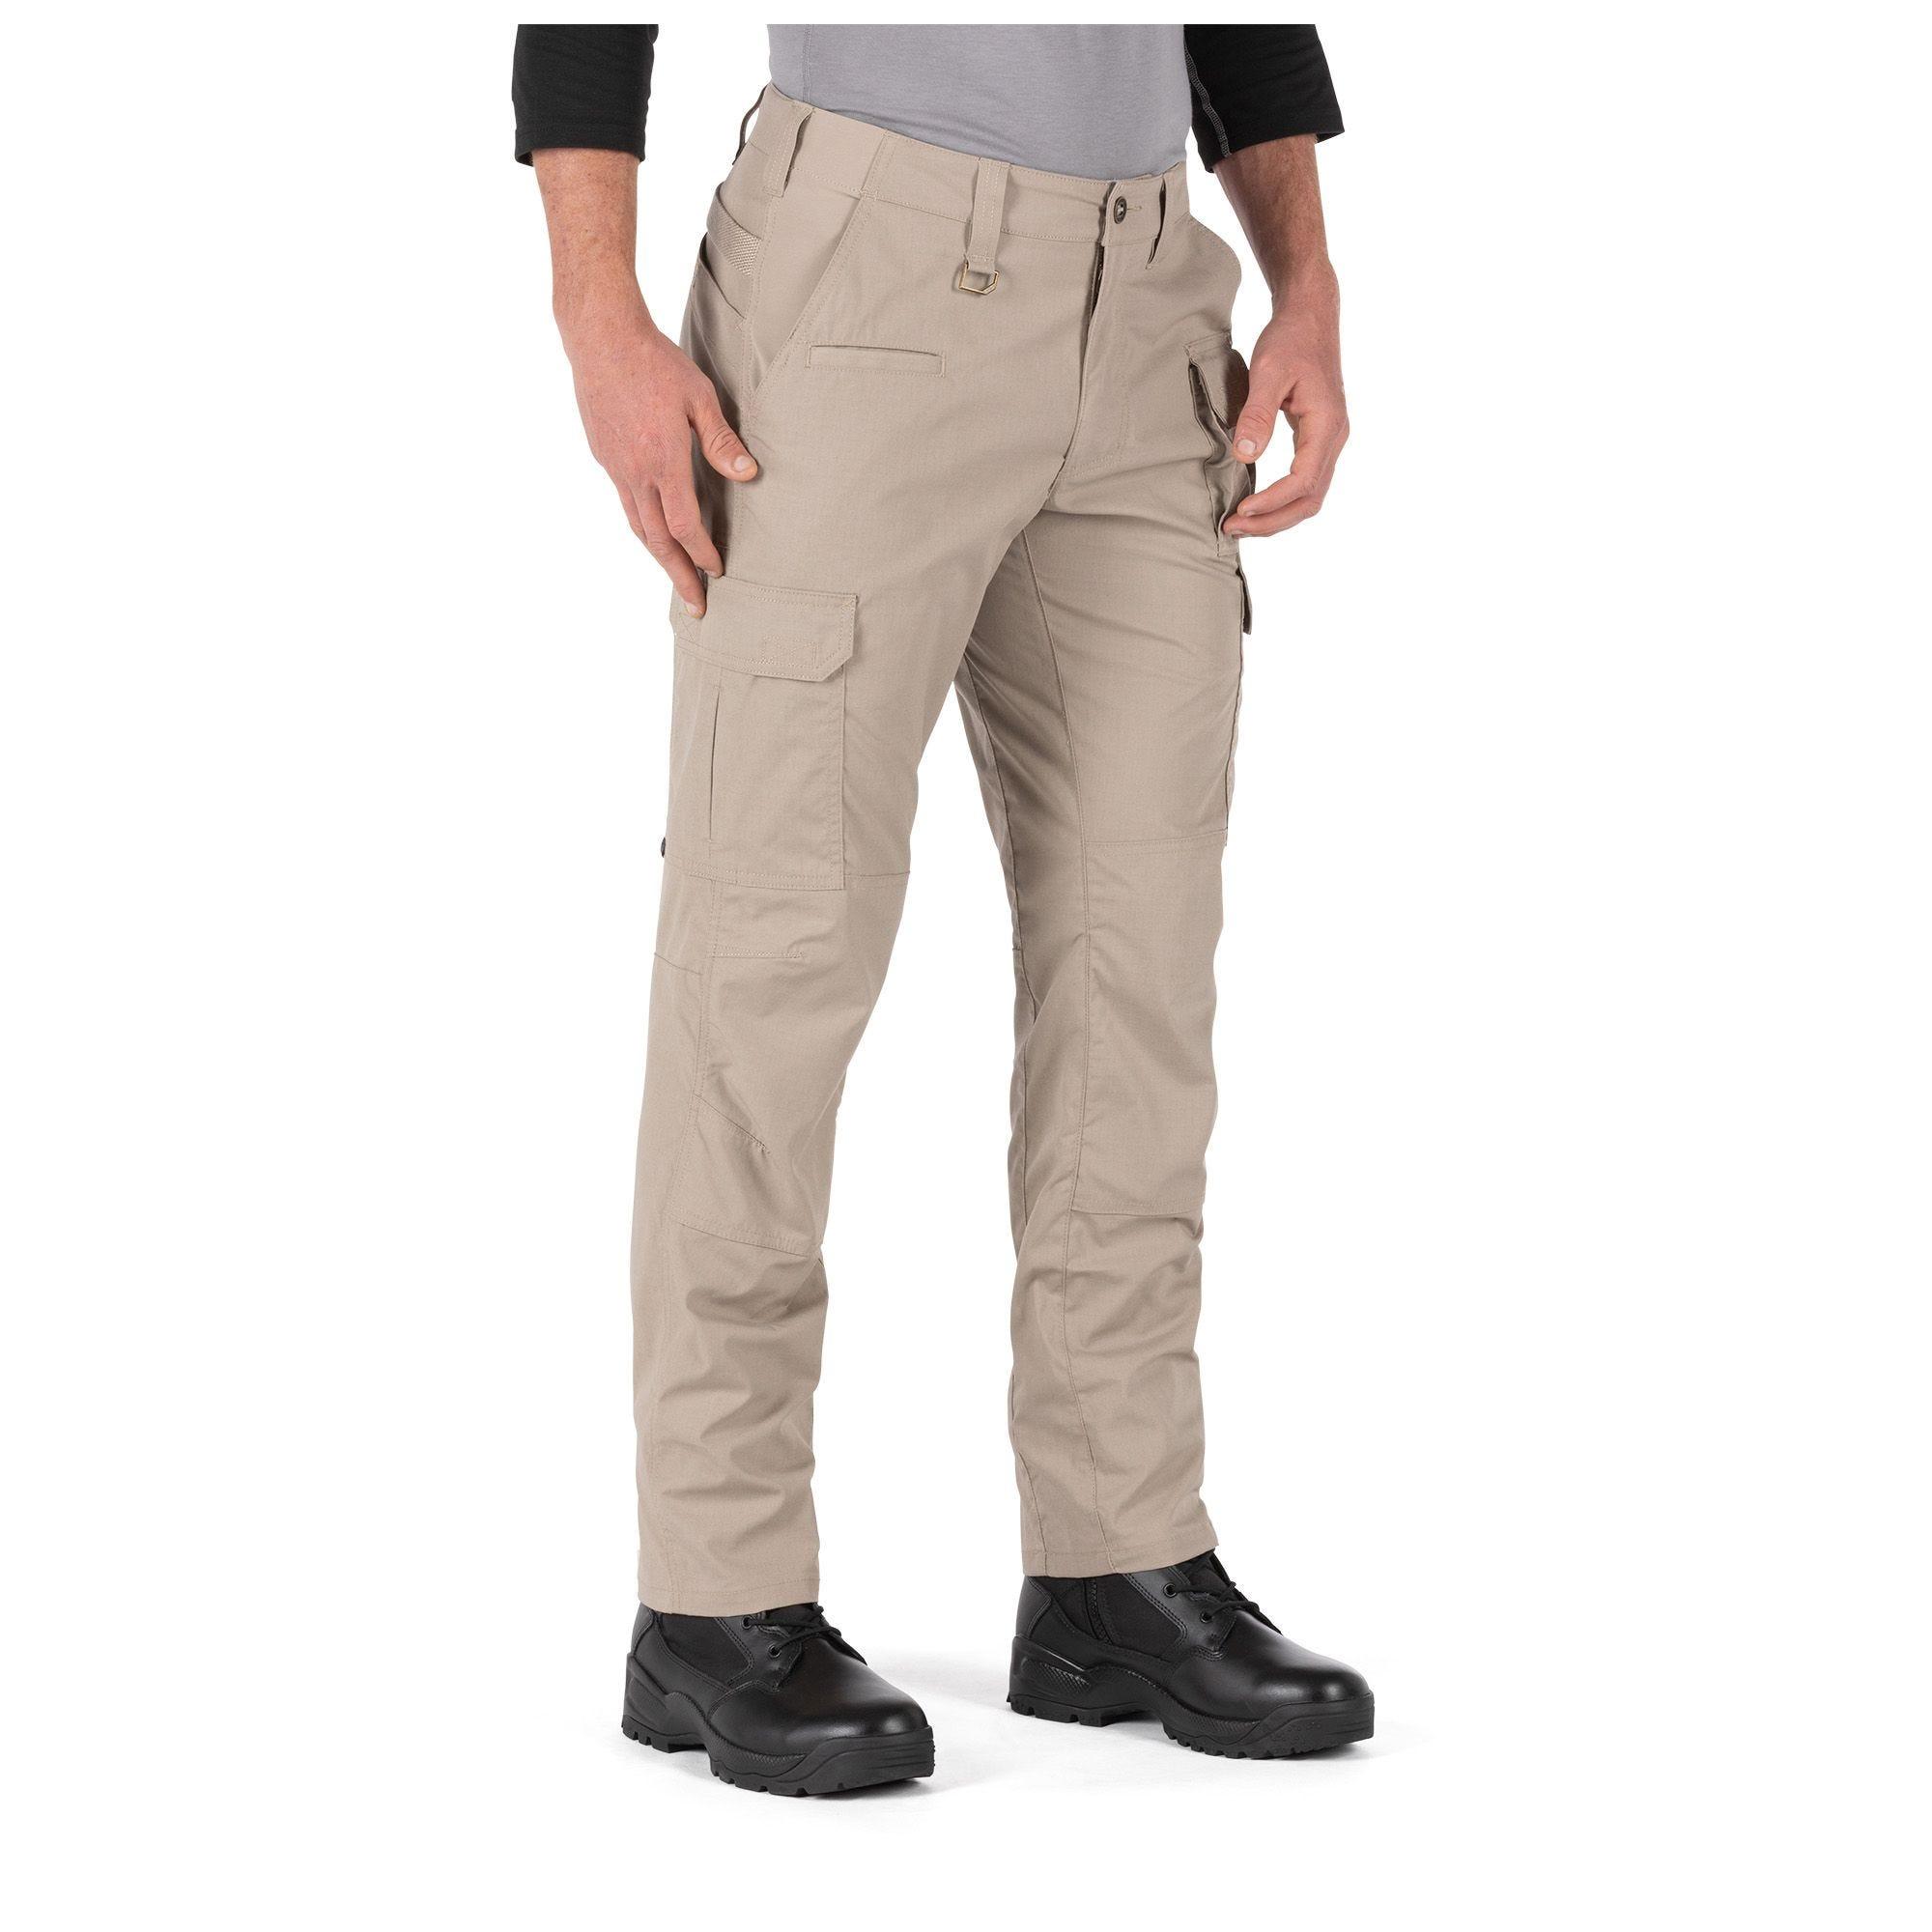 Pantalones 5 11 Abr Pro Police Tactical Equipment